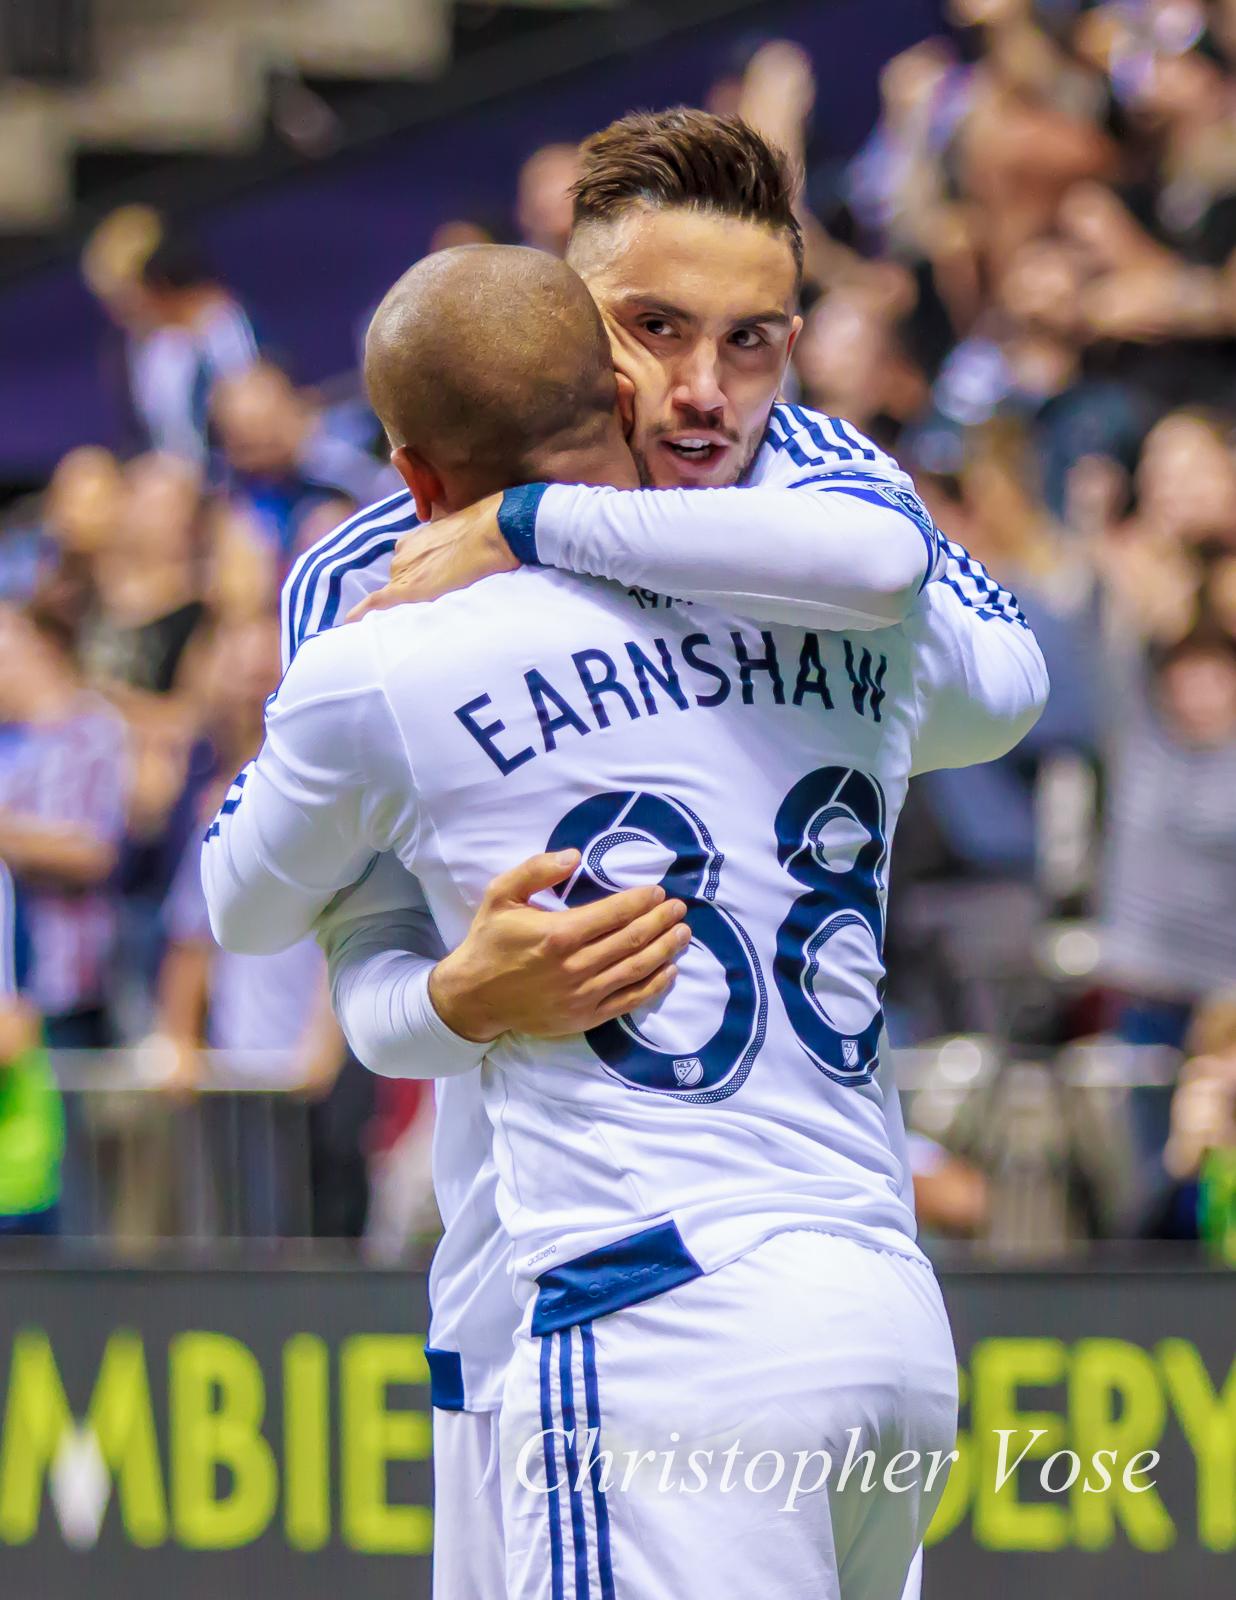 2015-03-28 Robert Earnshaw and Pedro Morales Goal Celebration.jpg